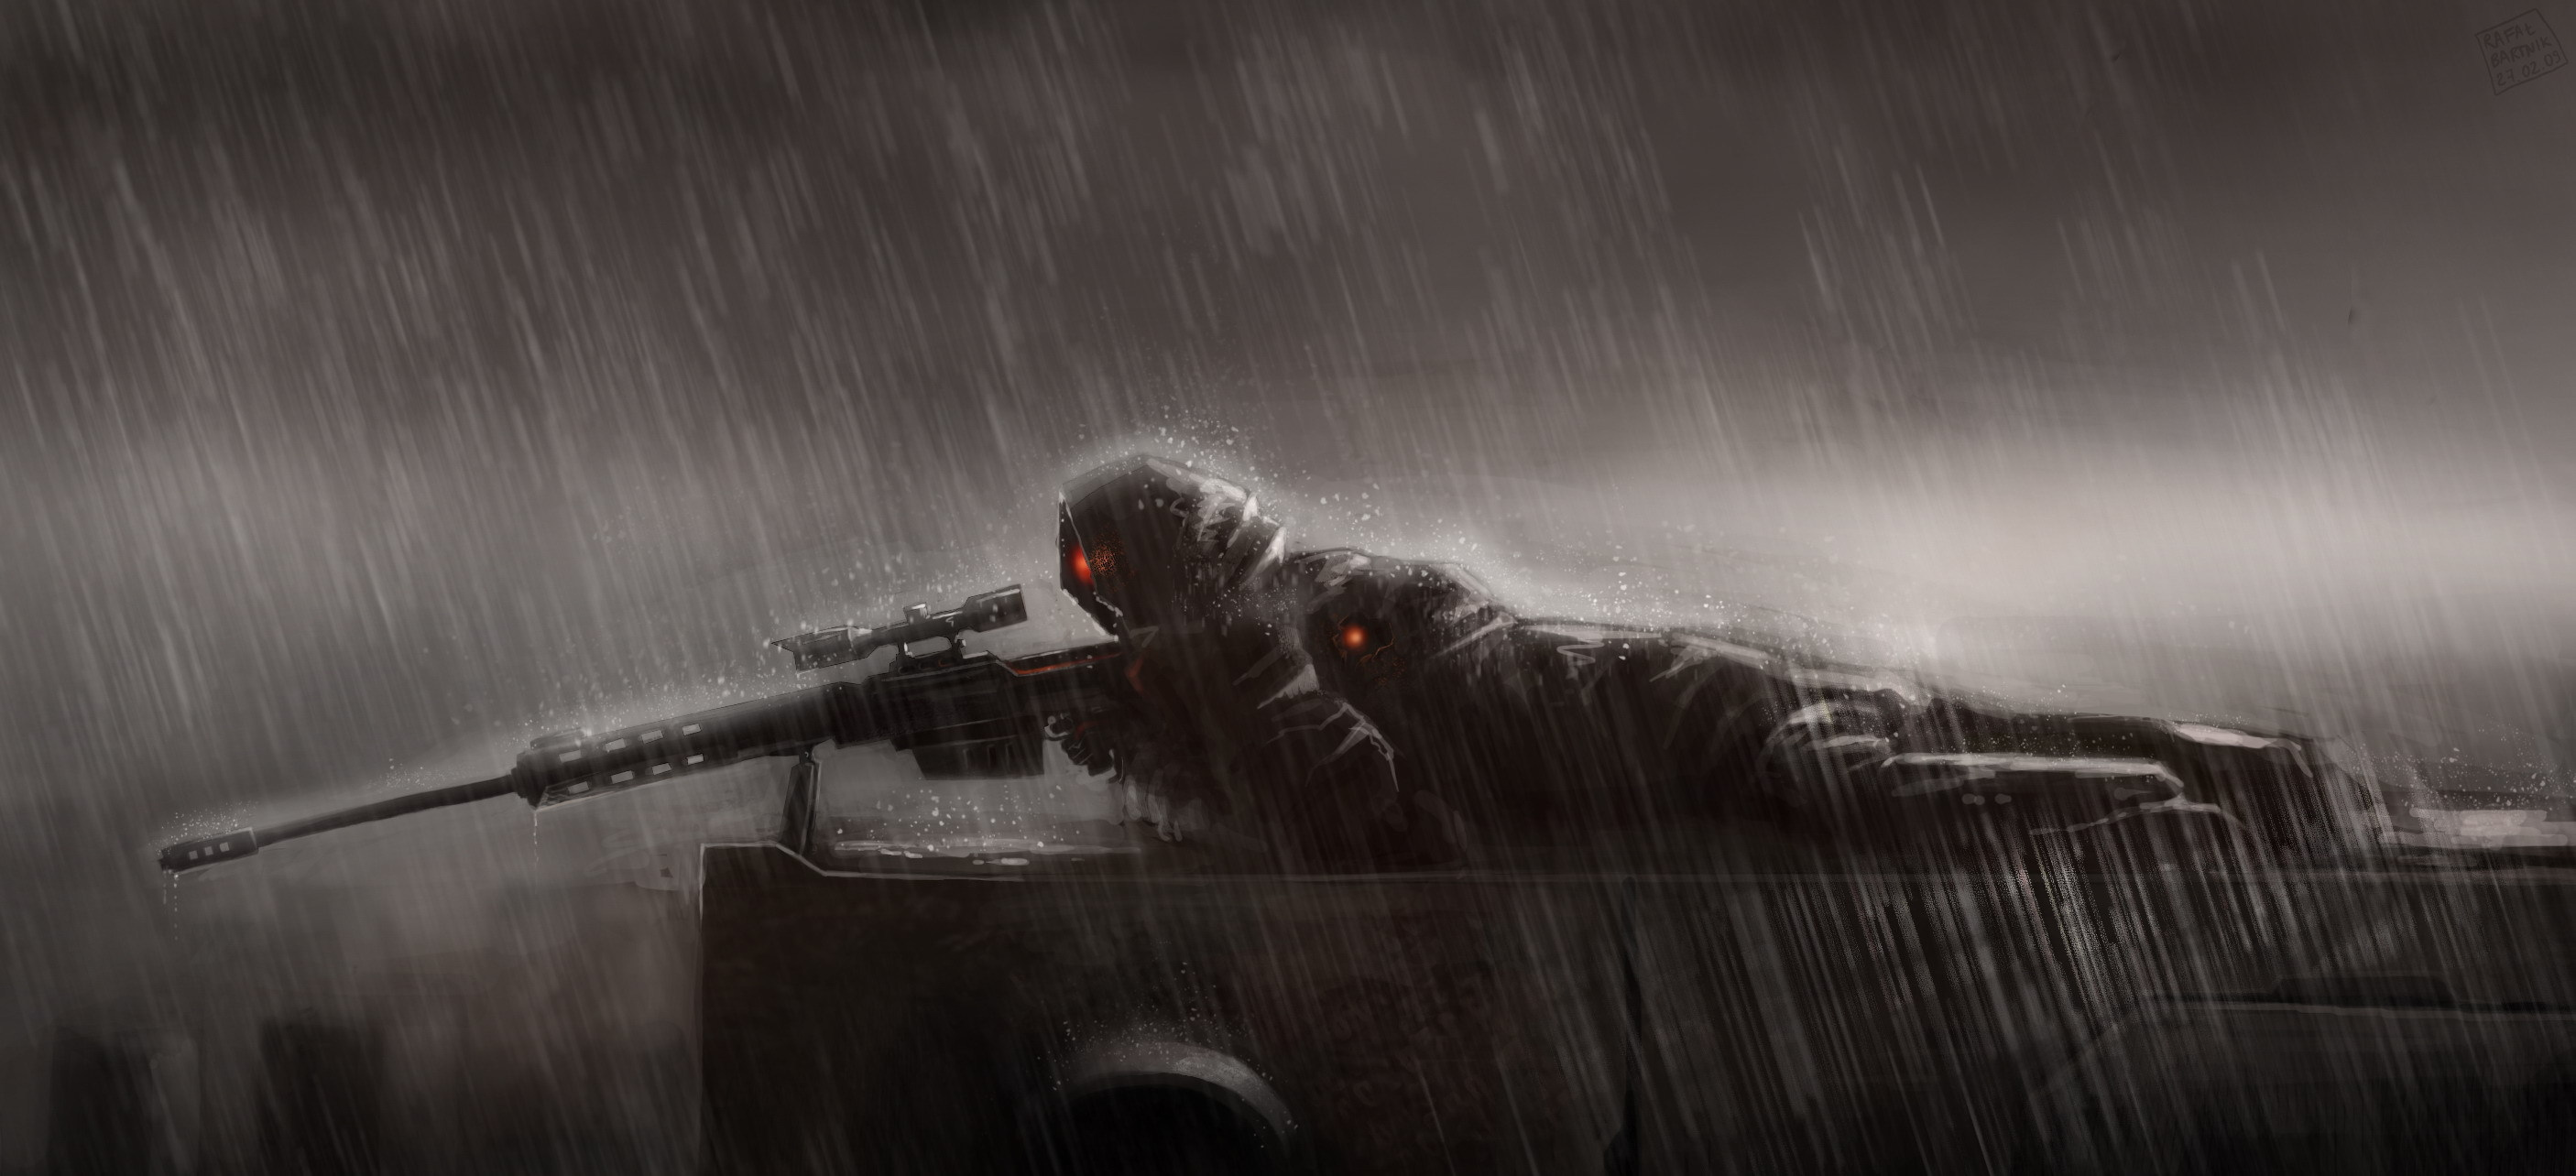 Sniper rain sniper lies position rain sniper rifle wallpaper sniper rain sniper lies position rain sniper rifle wallpaper 2812x1284 112998 wallpaperup voltagebd Choice Image